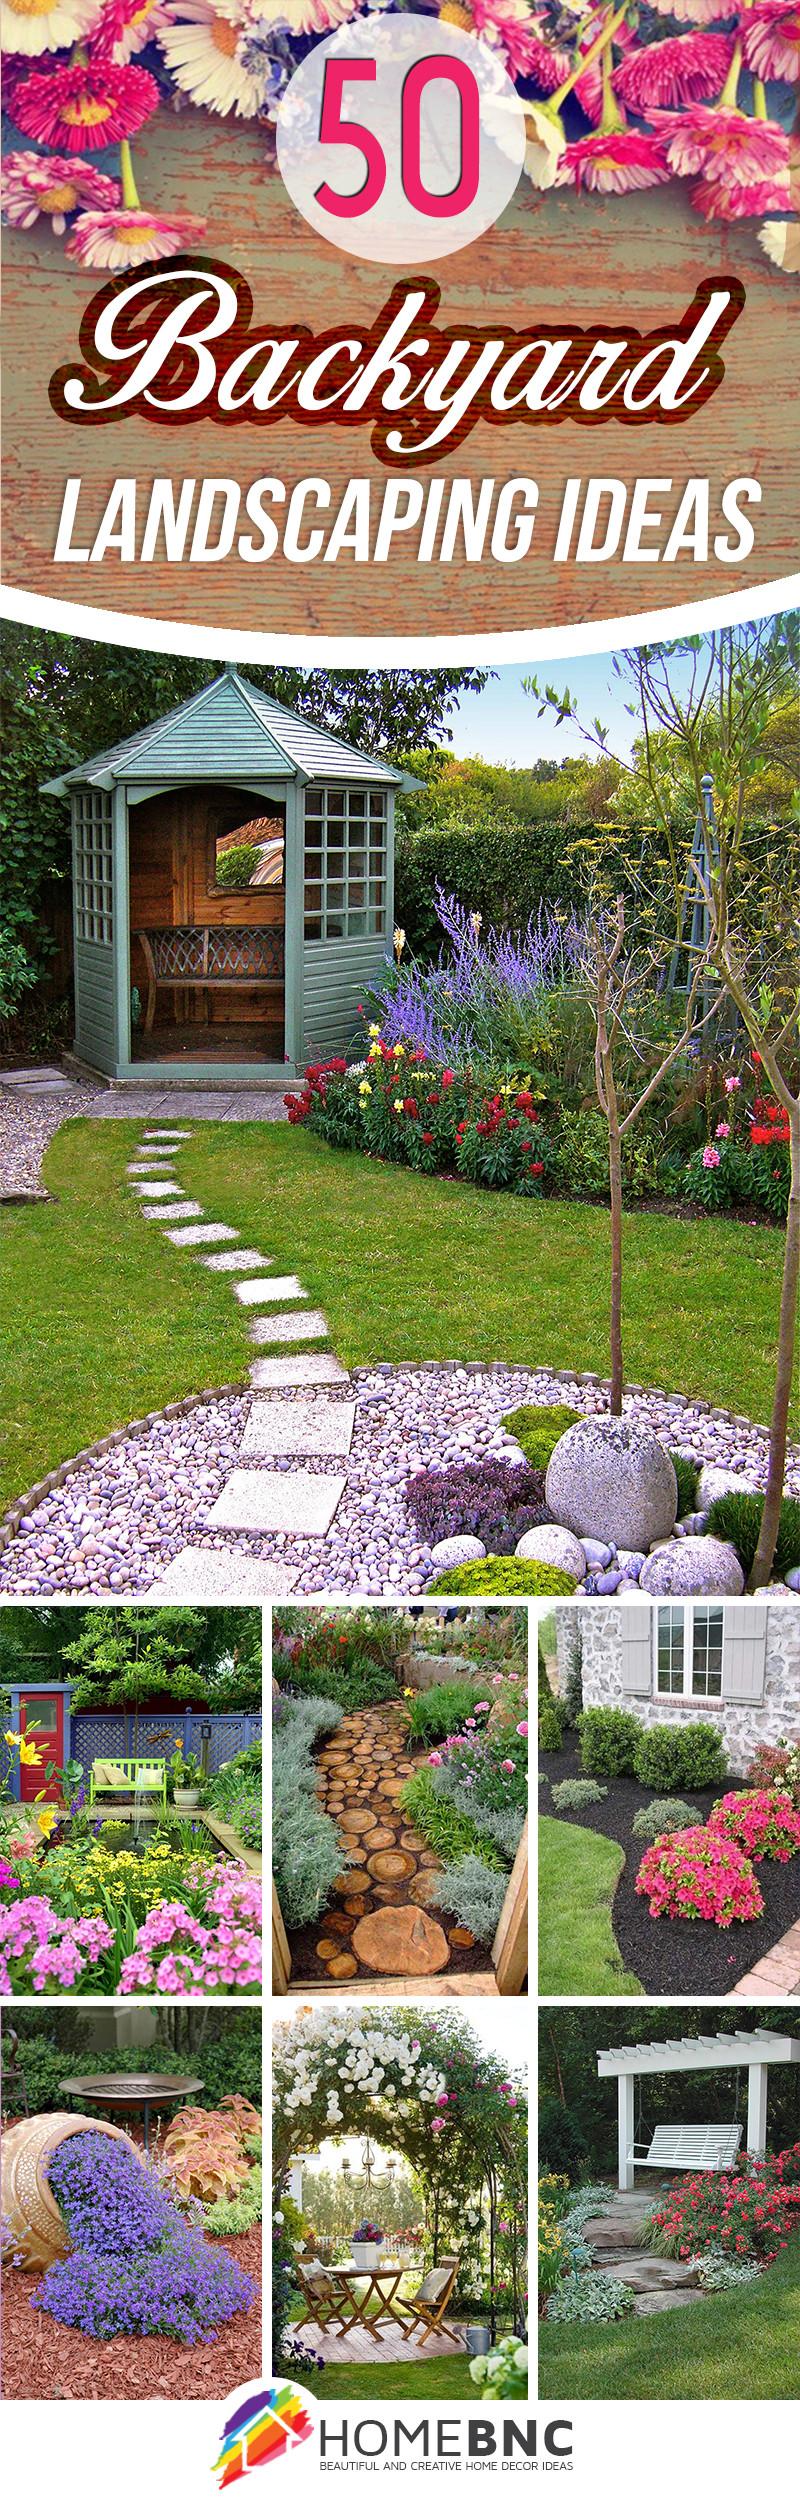 Best ideas about Backyard Landscape Ideas . Save or Pin 50 Best Backyard Landscaping Ideas and Designs in 2017 Now.